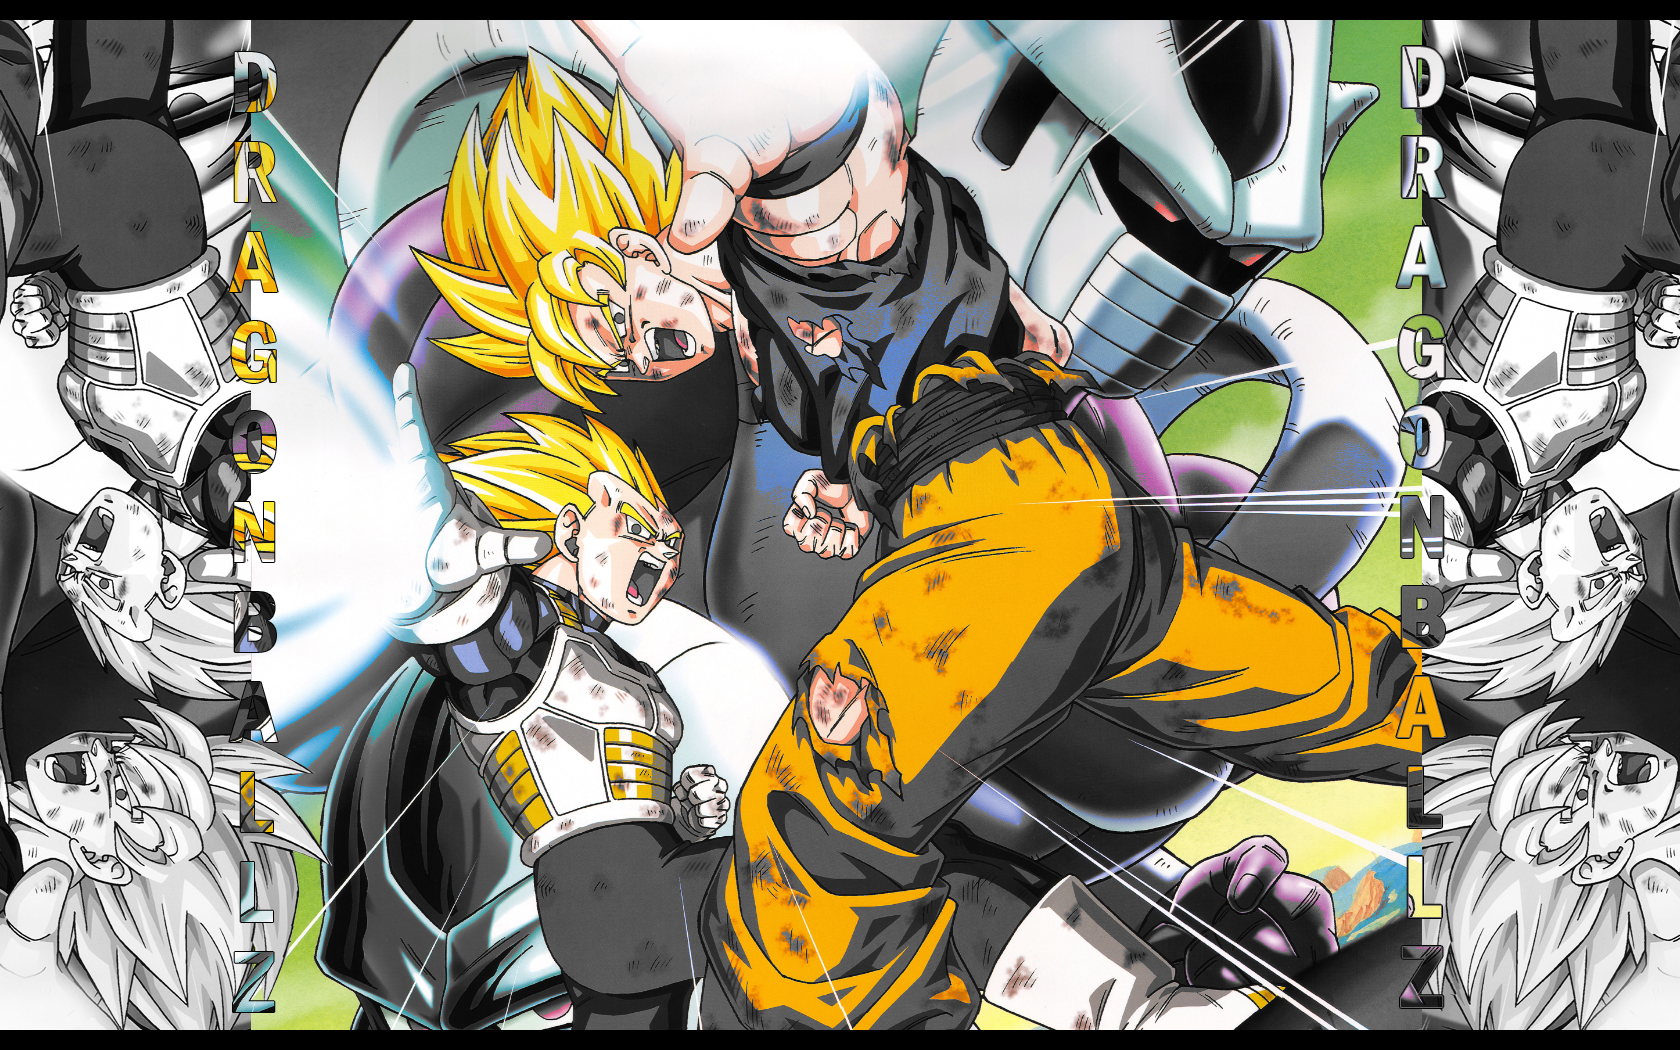 Wallpaper HD de dragon ball z y Naruto shippuden   Taringa 1680x1050